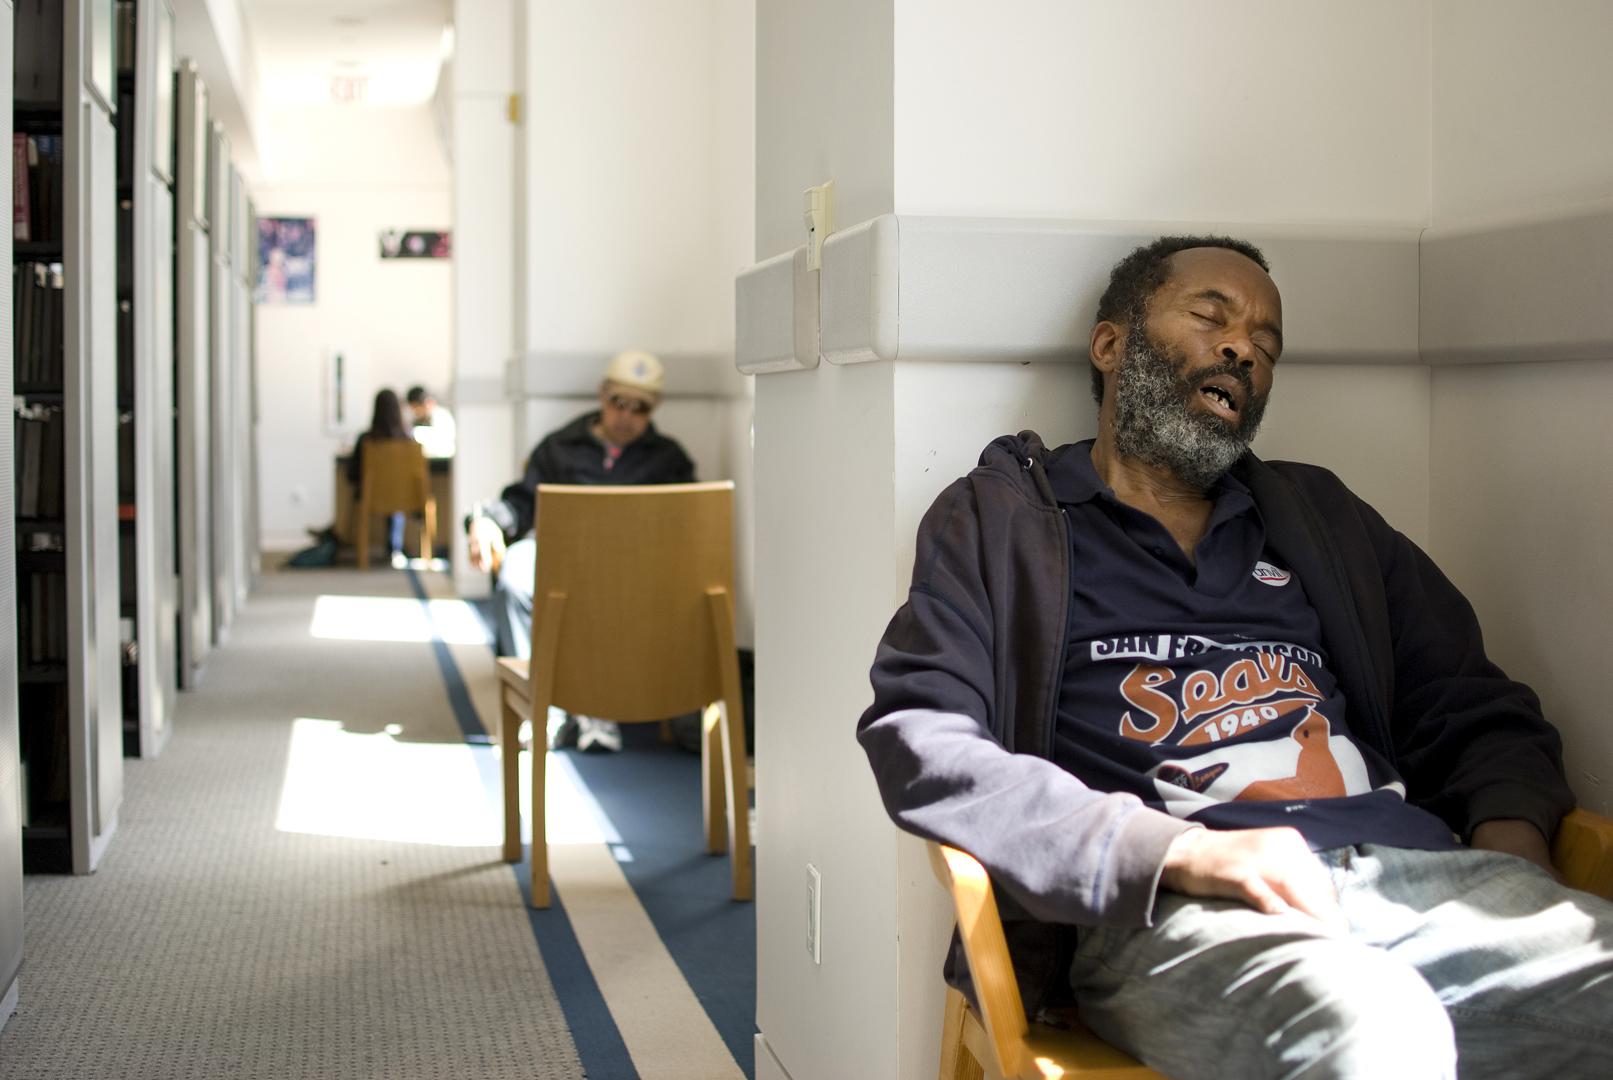 A San Francisco Public Library patron takes a mid-day nap at the Main Branch. San Francisco, CA.